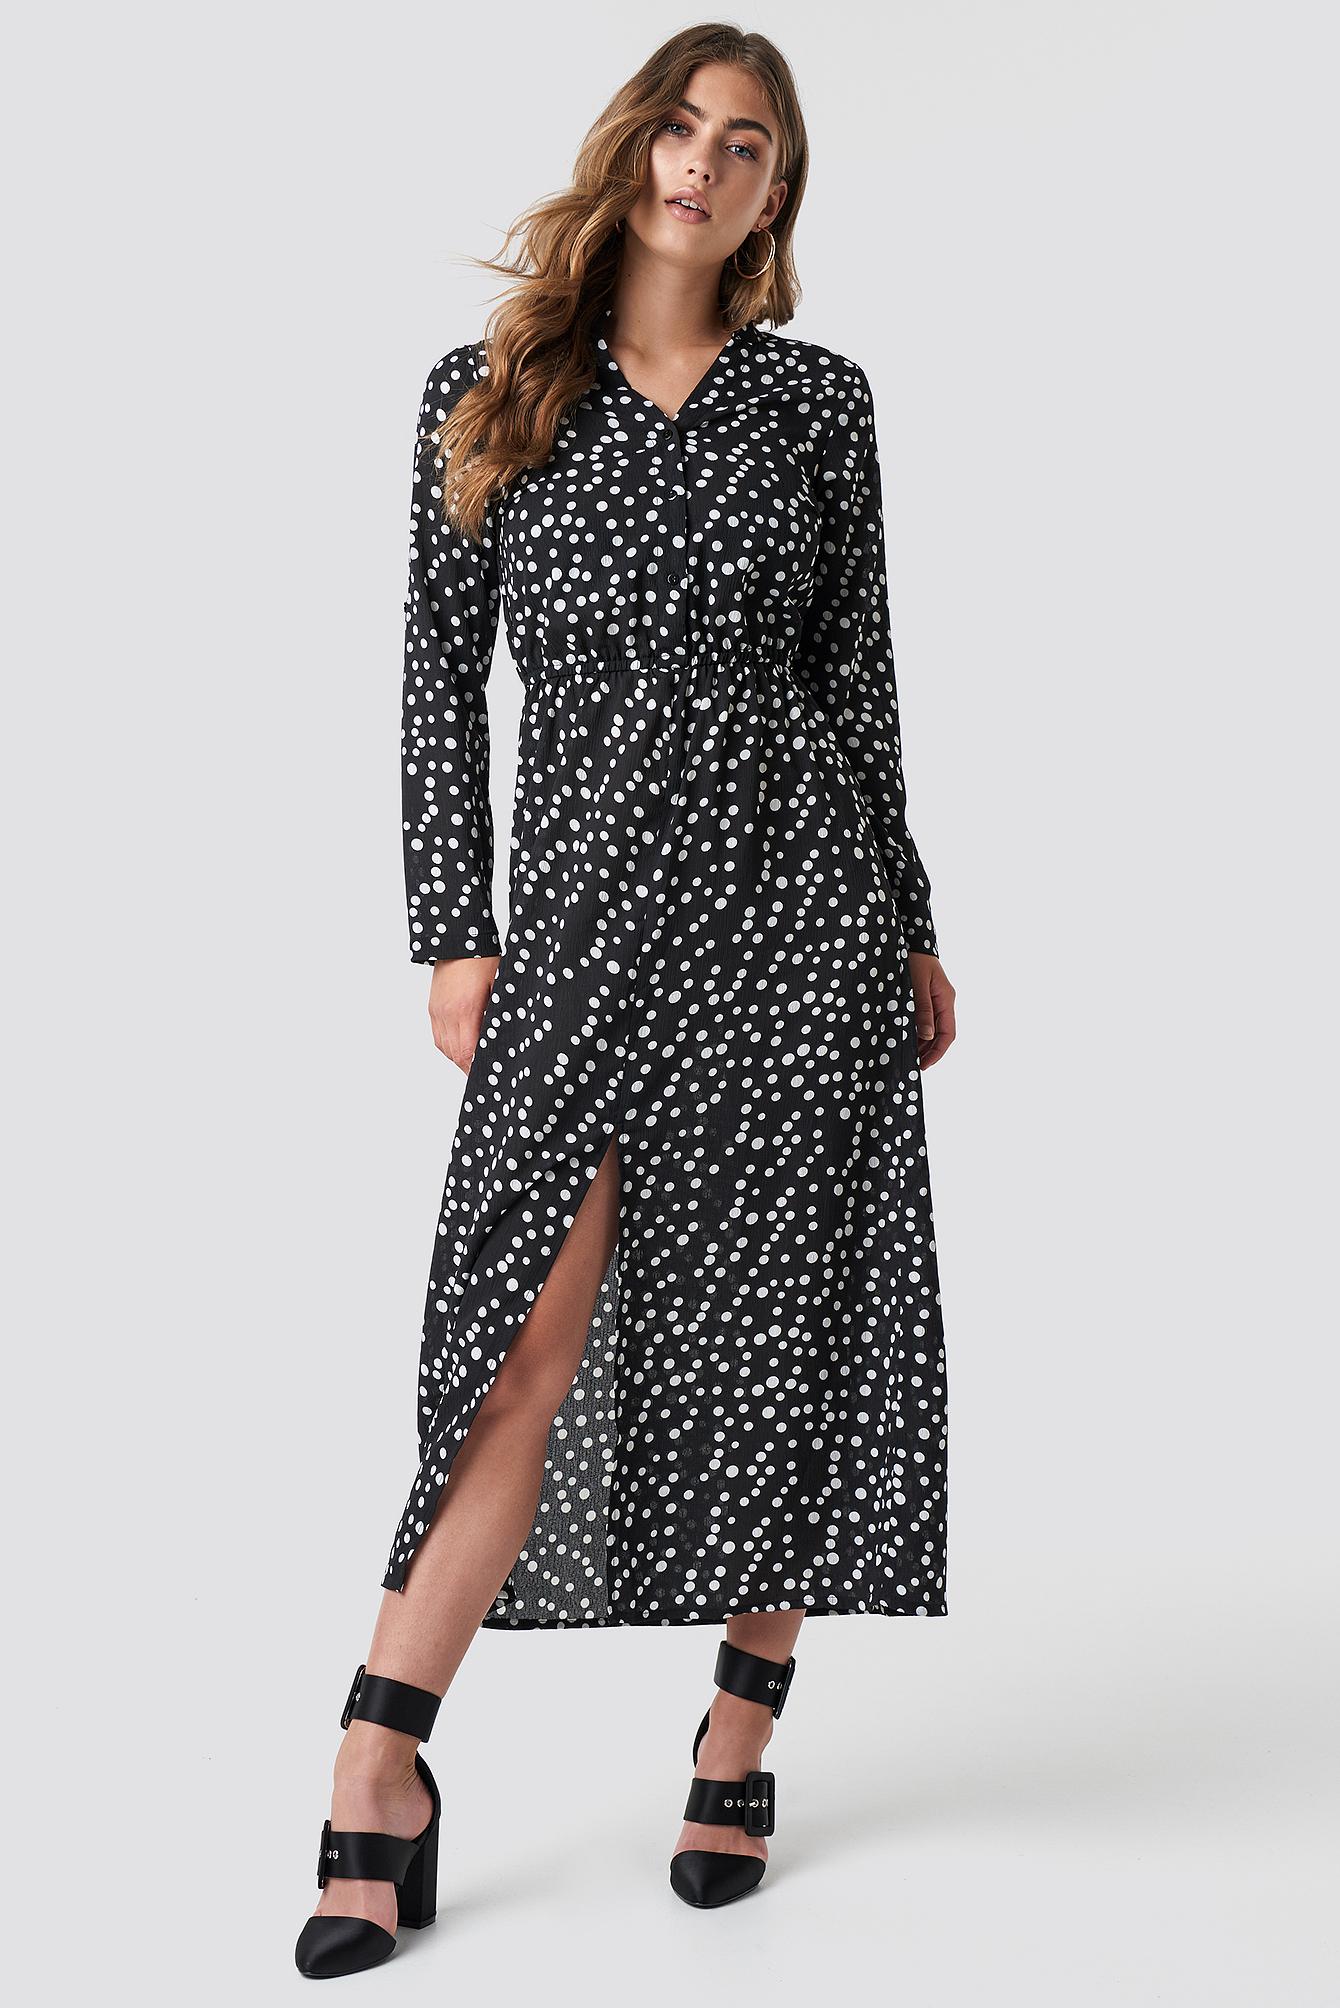 RUT & CIRCLE DOT LONG DRESS - BLACK